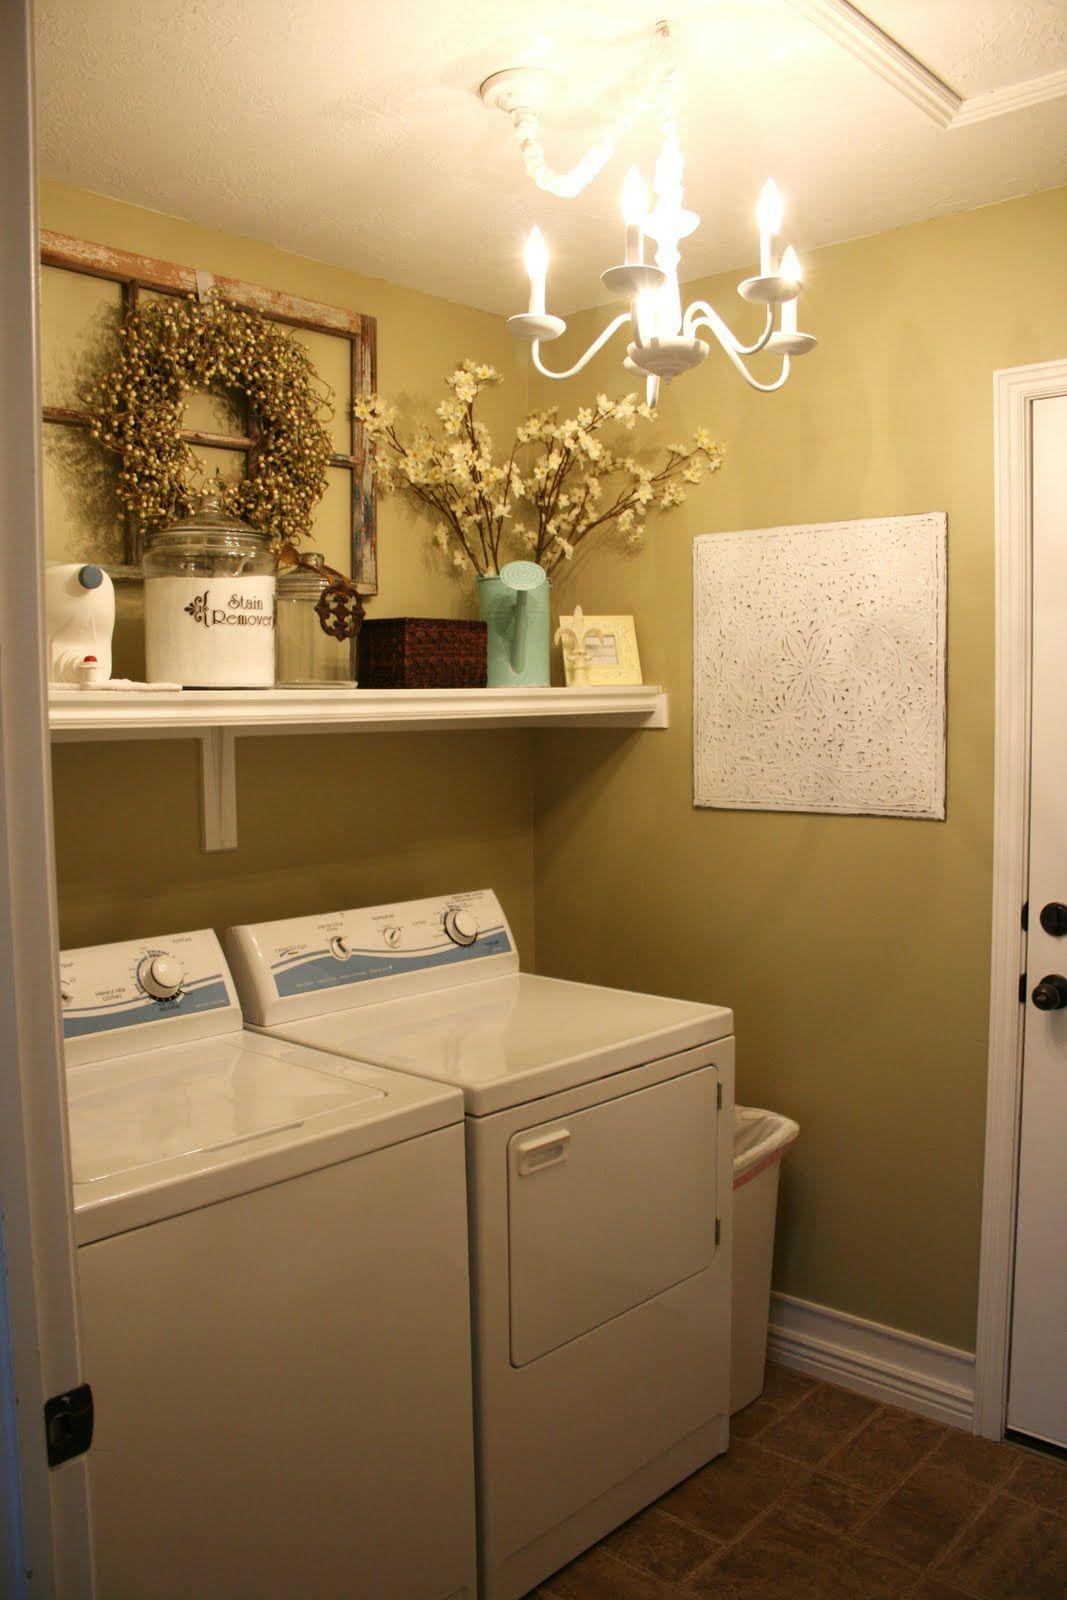 Basement Laundry Room Makeover Ideas Decor laundry room redo | laundry rooms, laundry and laundry powder